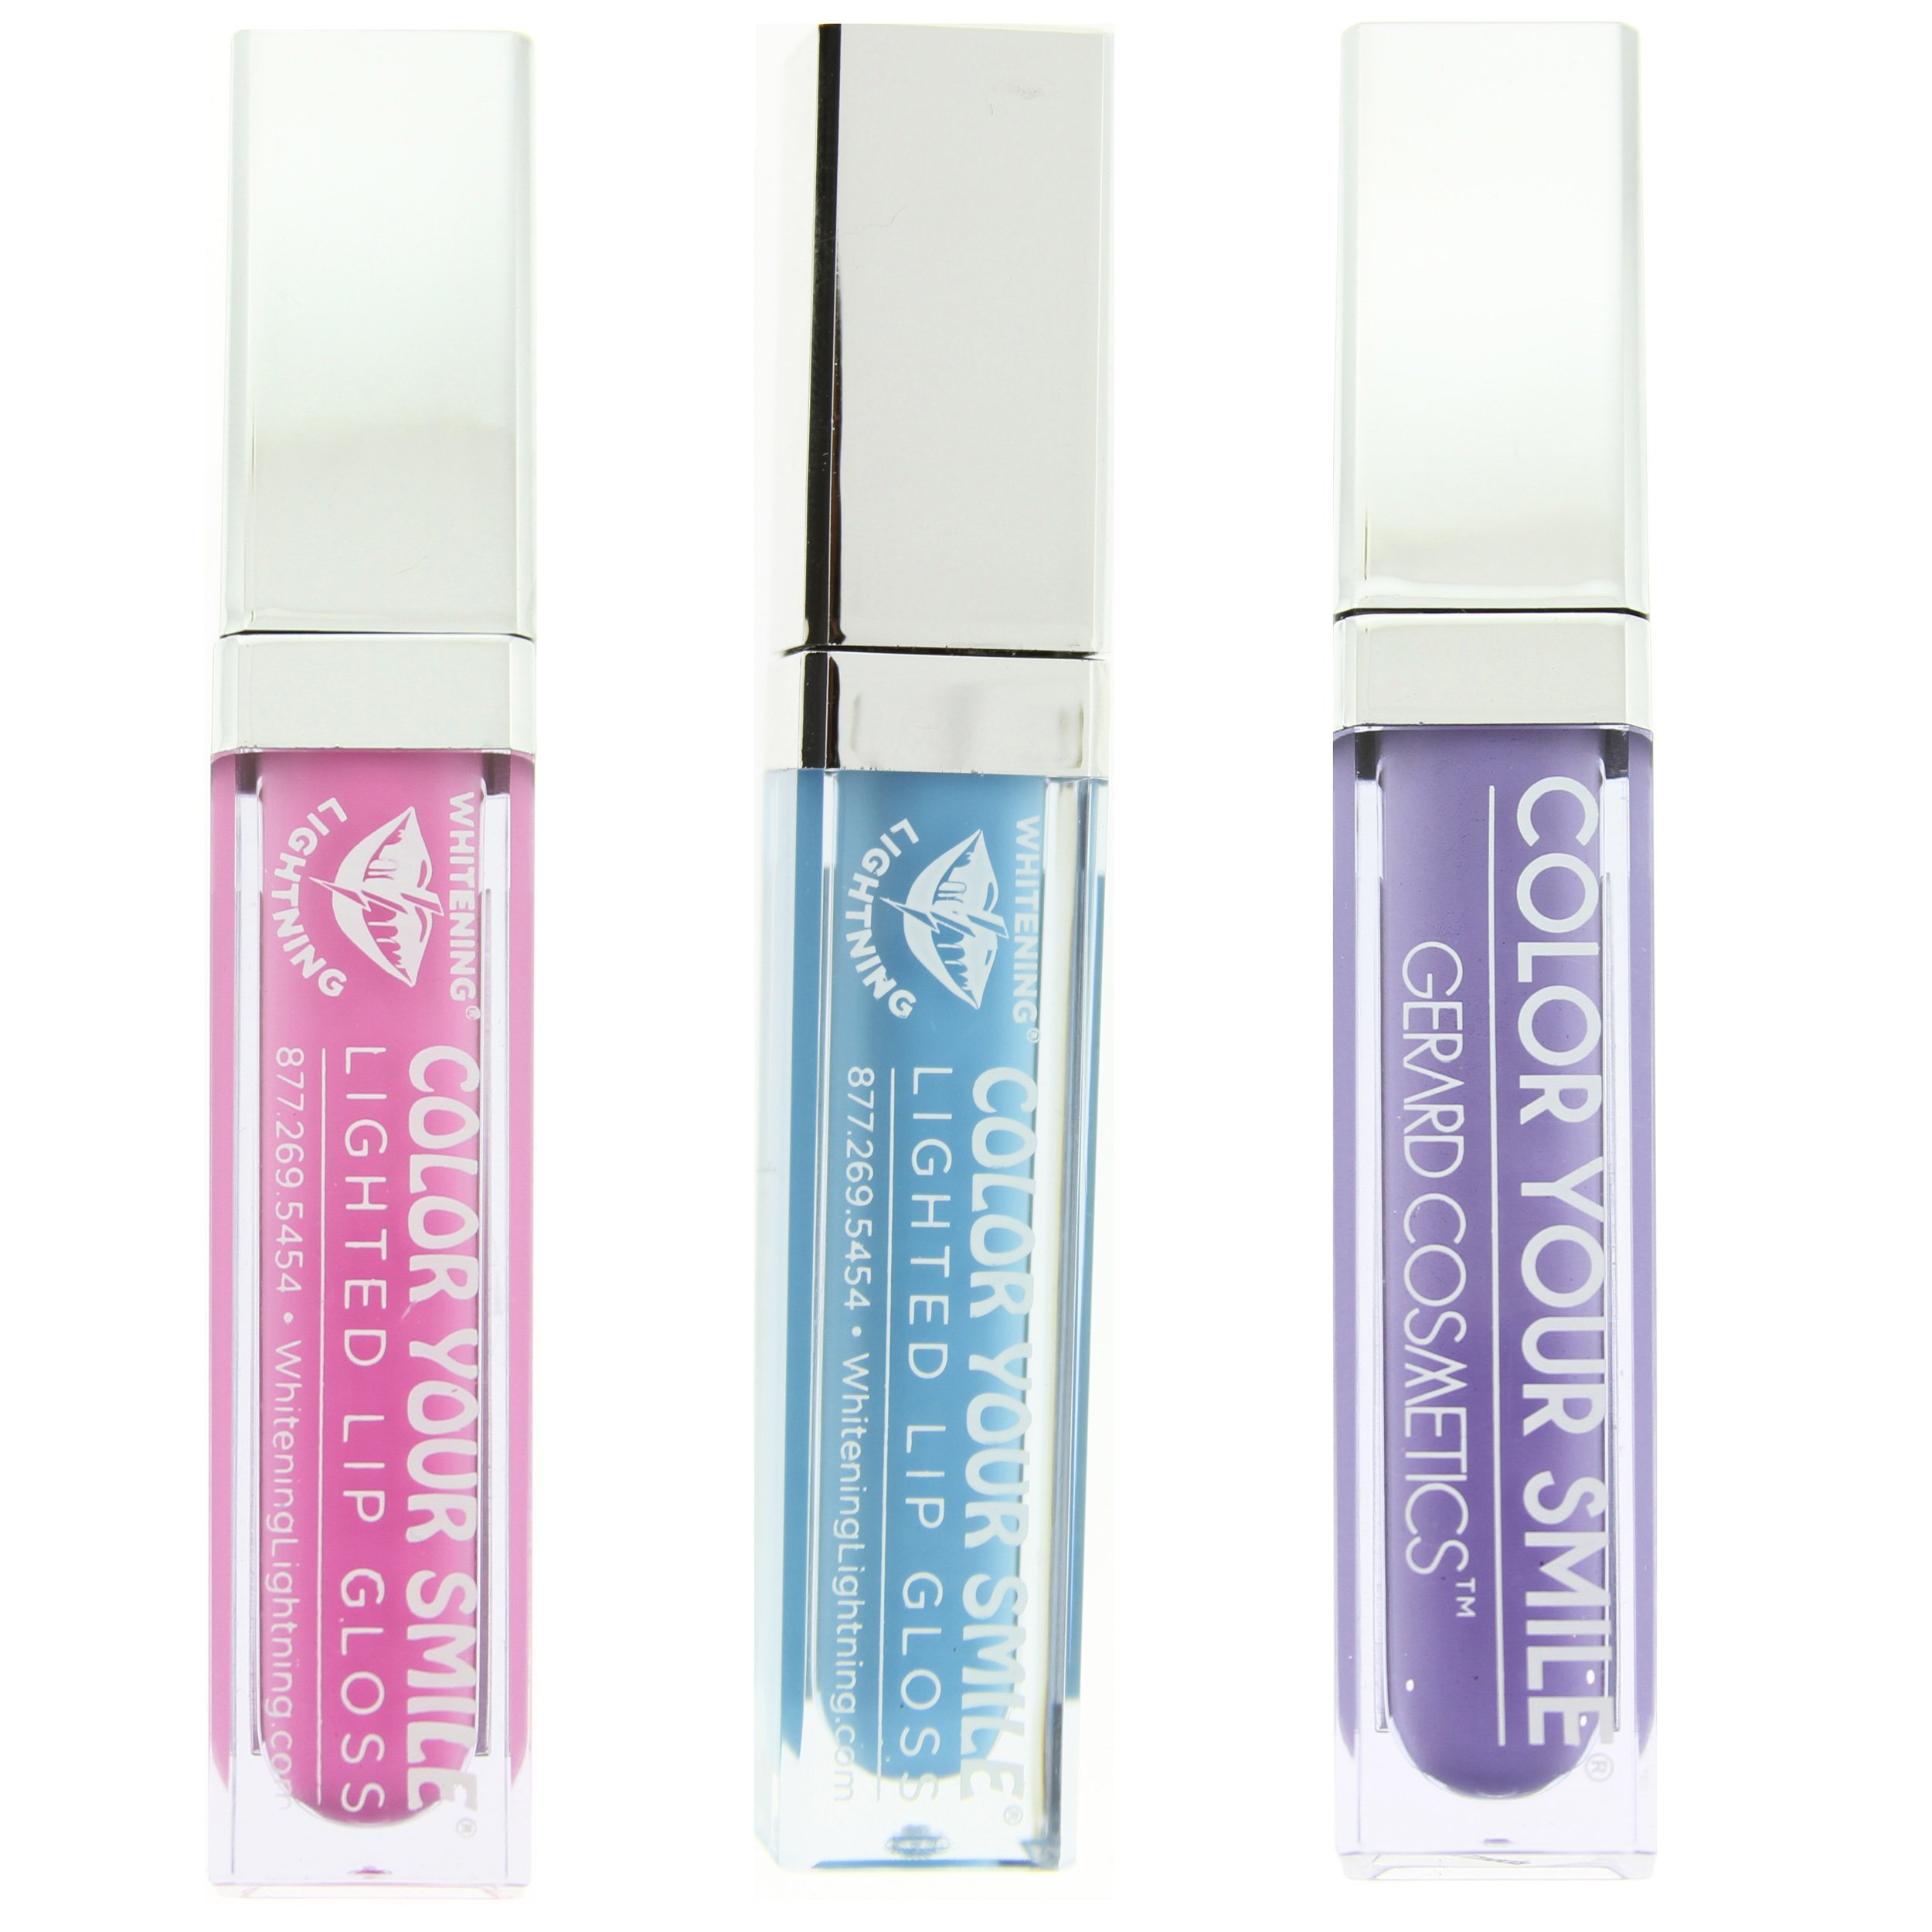 Color Your Smile Lighted Lip Gloss Trio Set 7 (Bahama ? Fiji -Bermuda)